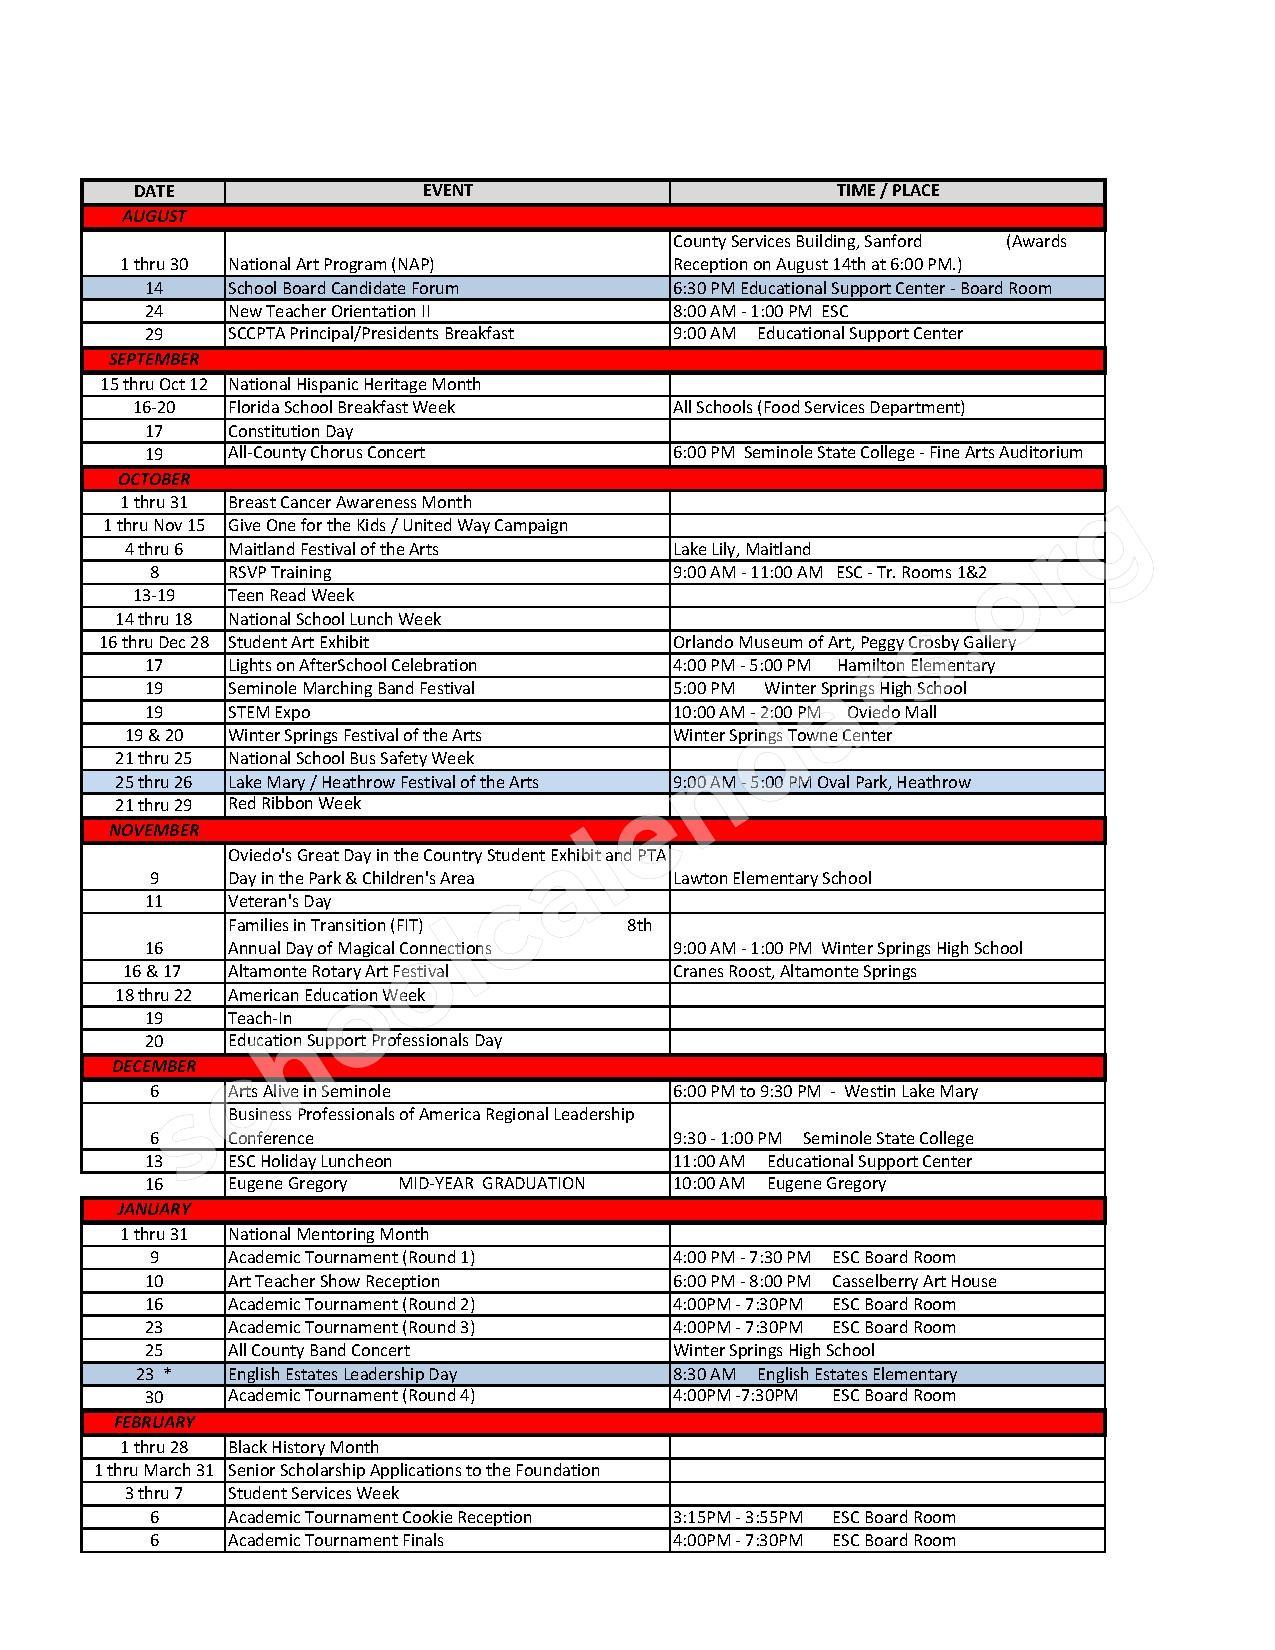 School Event Calendar Events Calendar – Sterling